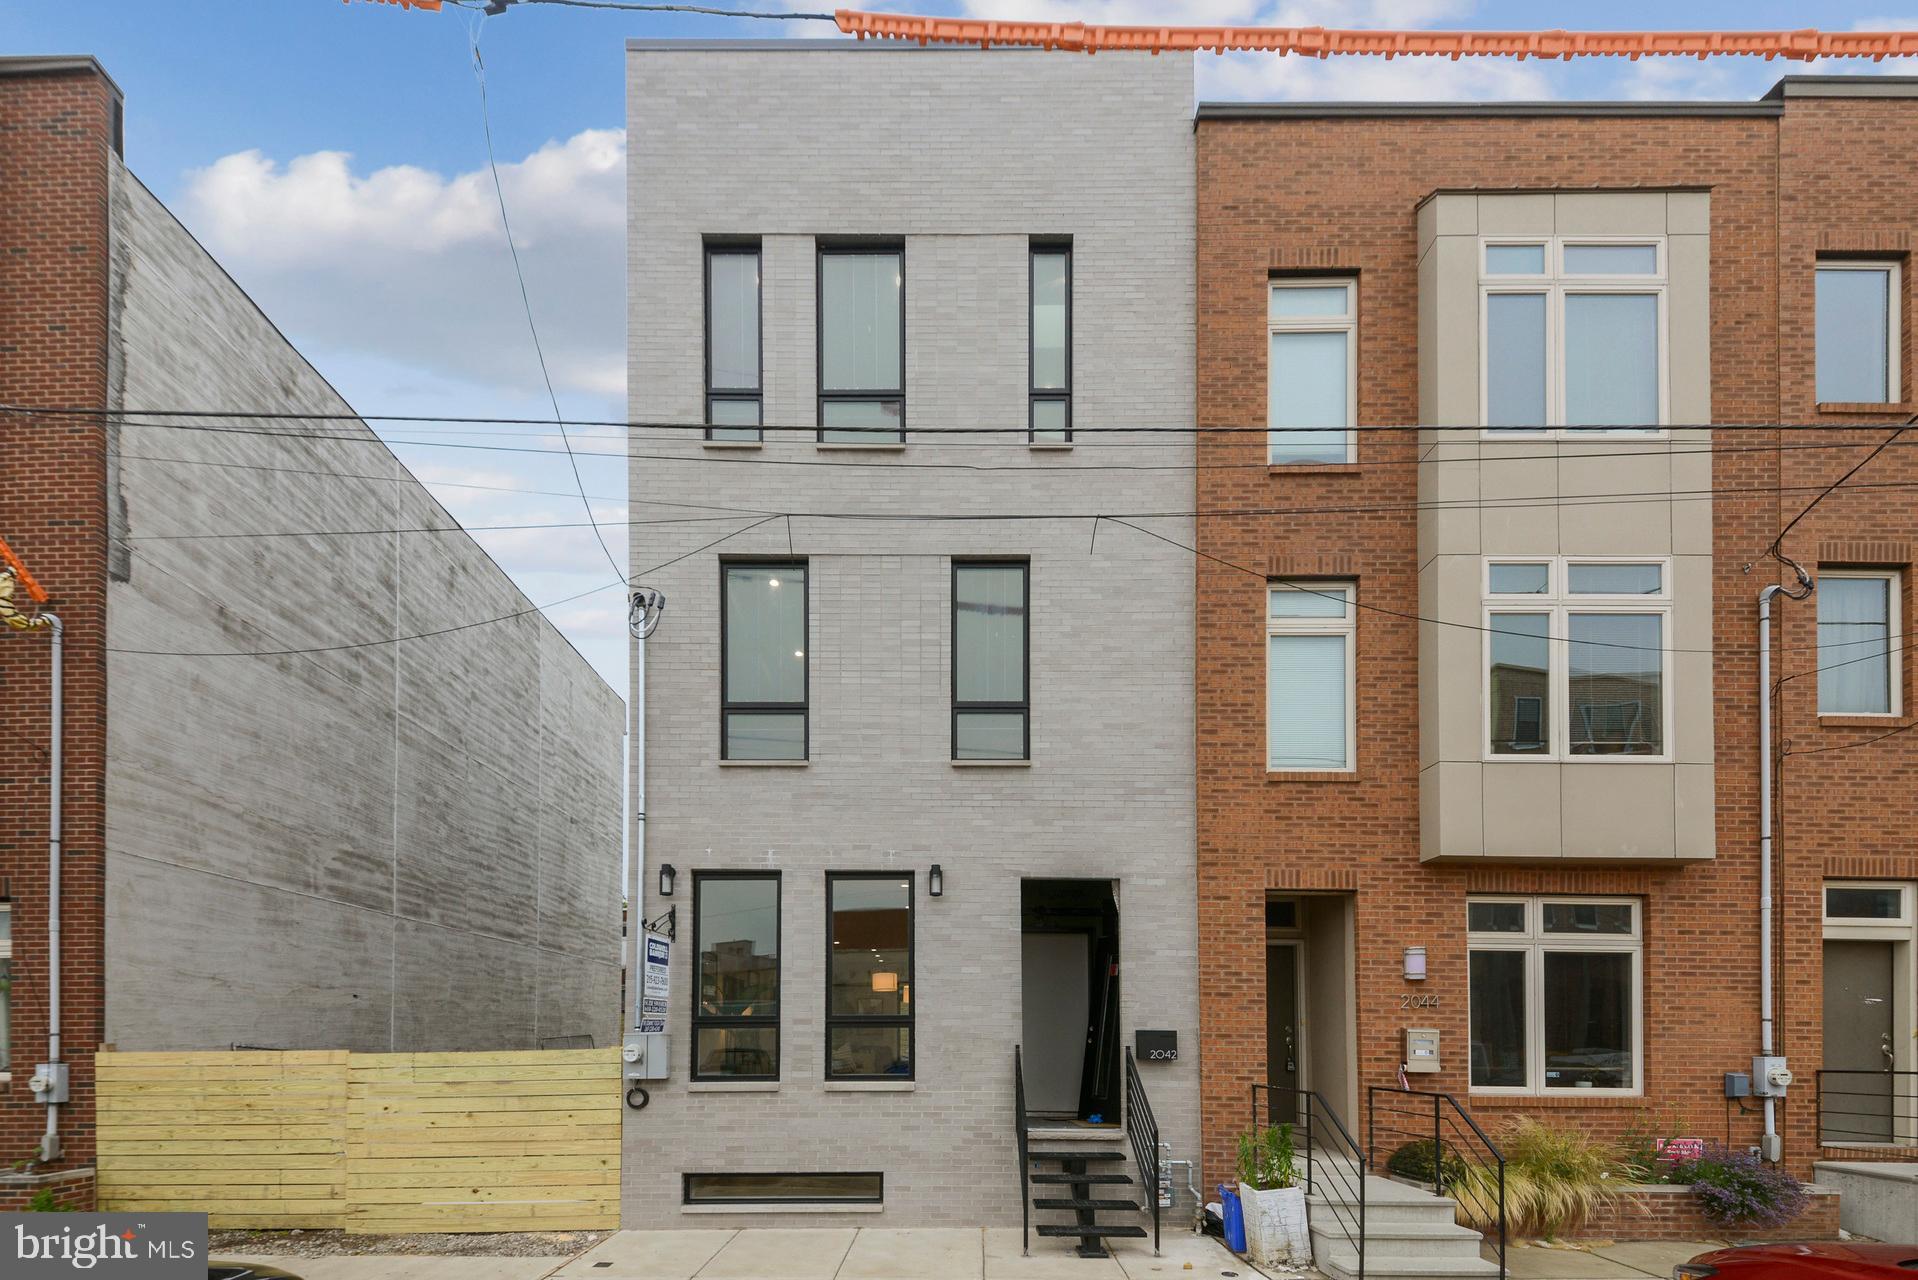 2042 TRENTON Ave, Philadelphia, PA, 19125